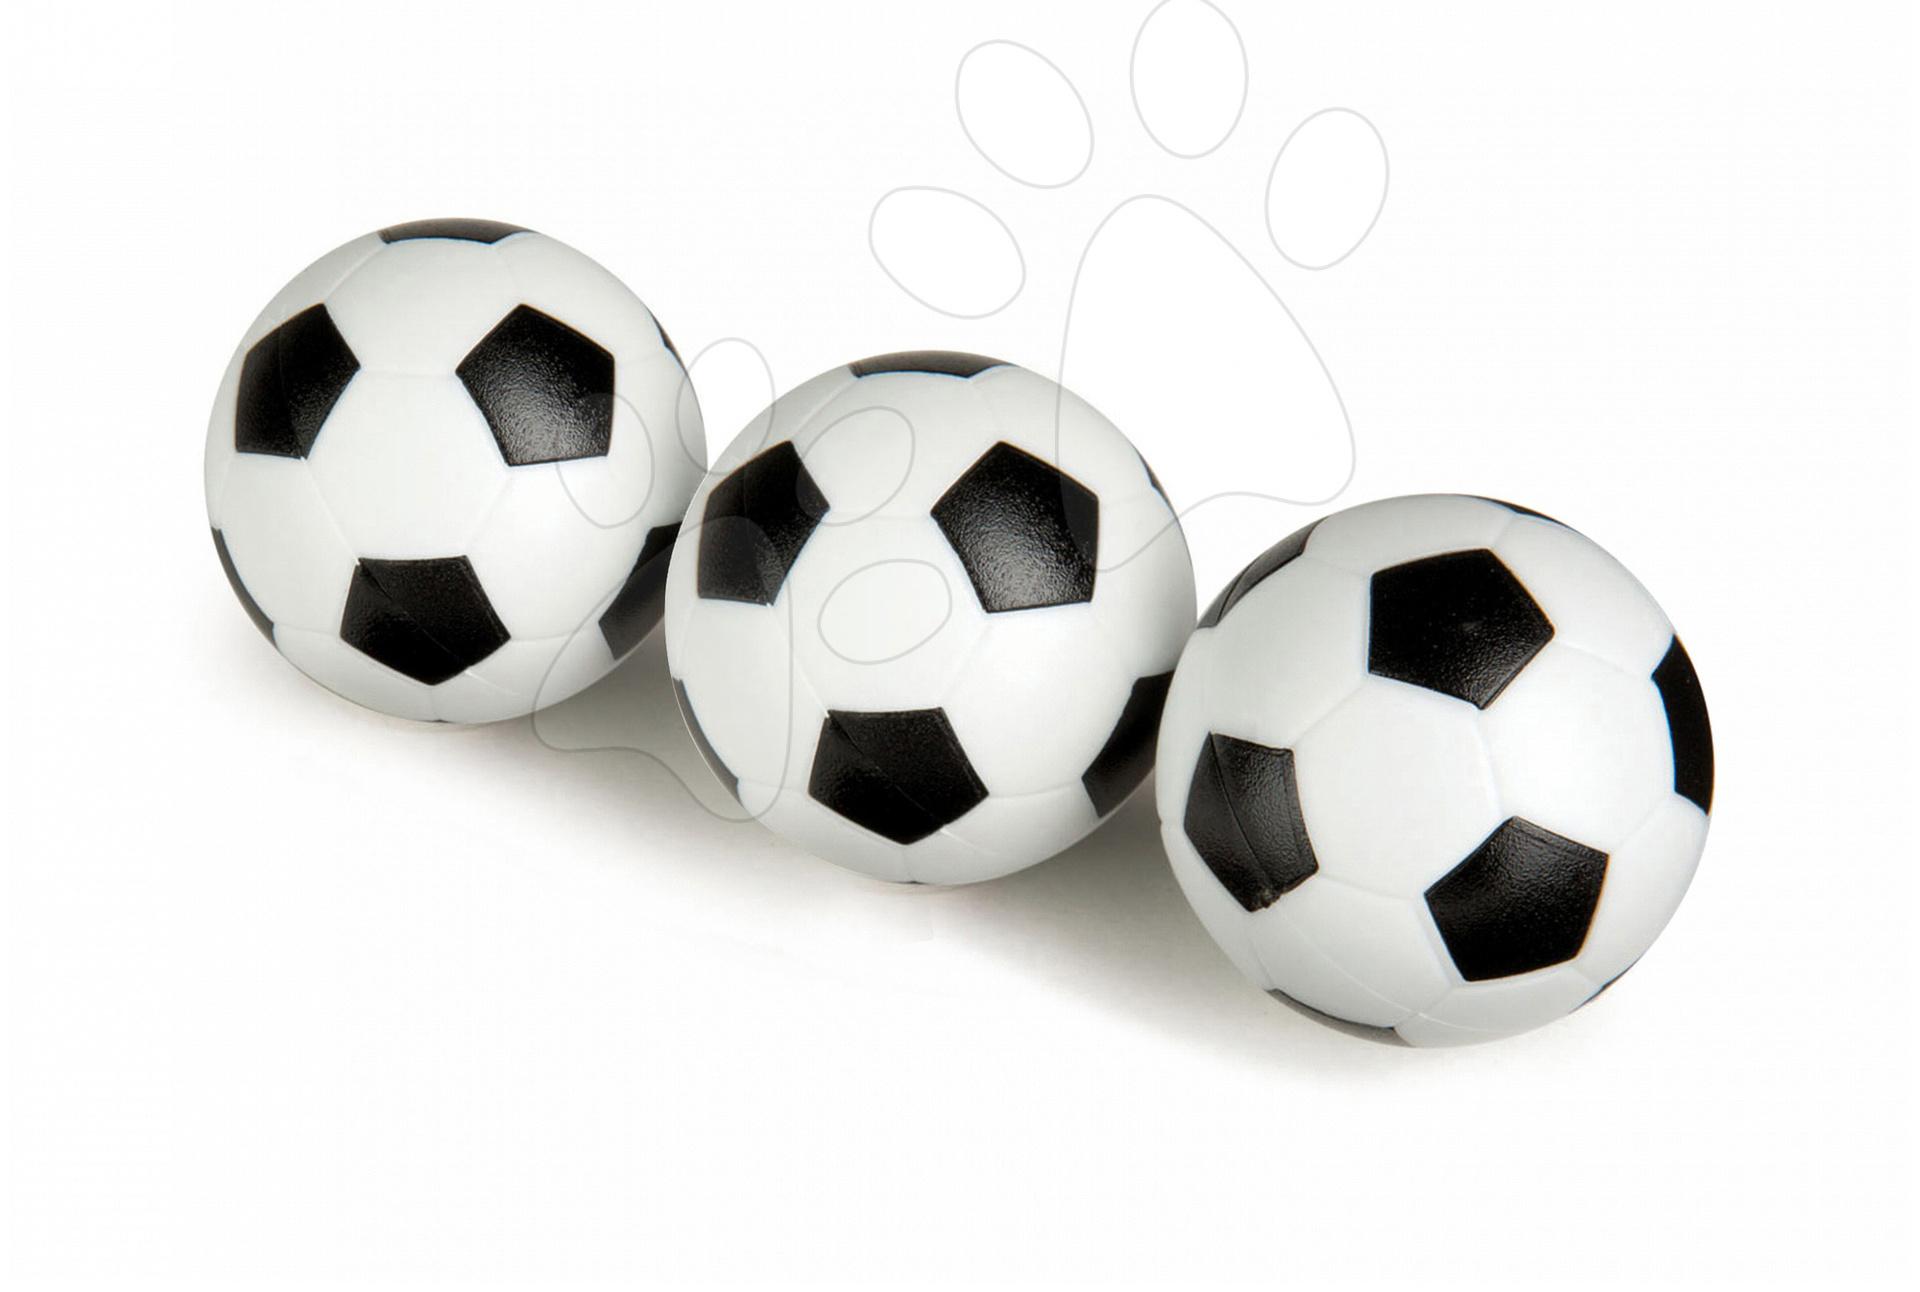 Stolný futbal - Futbalové loptičky Smoby 3 kusy